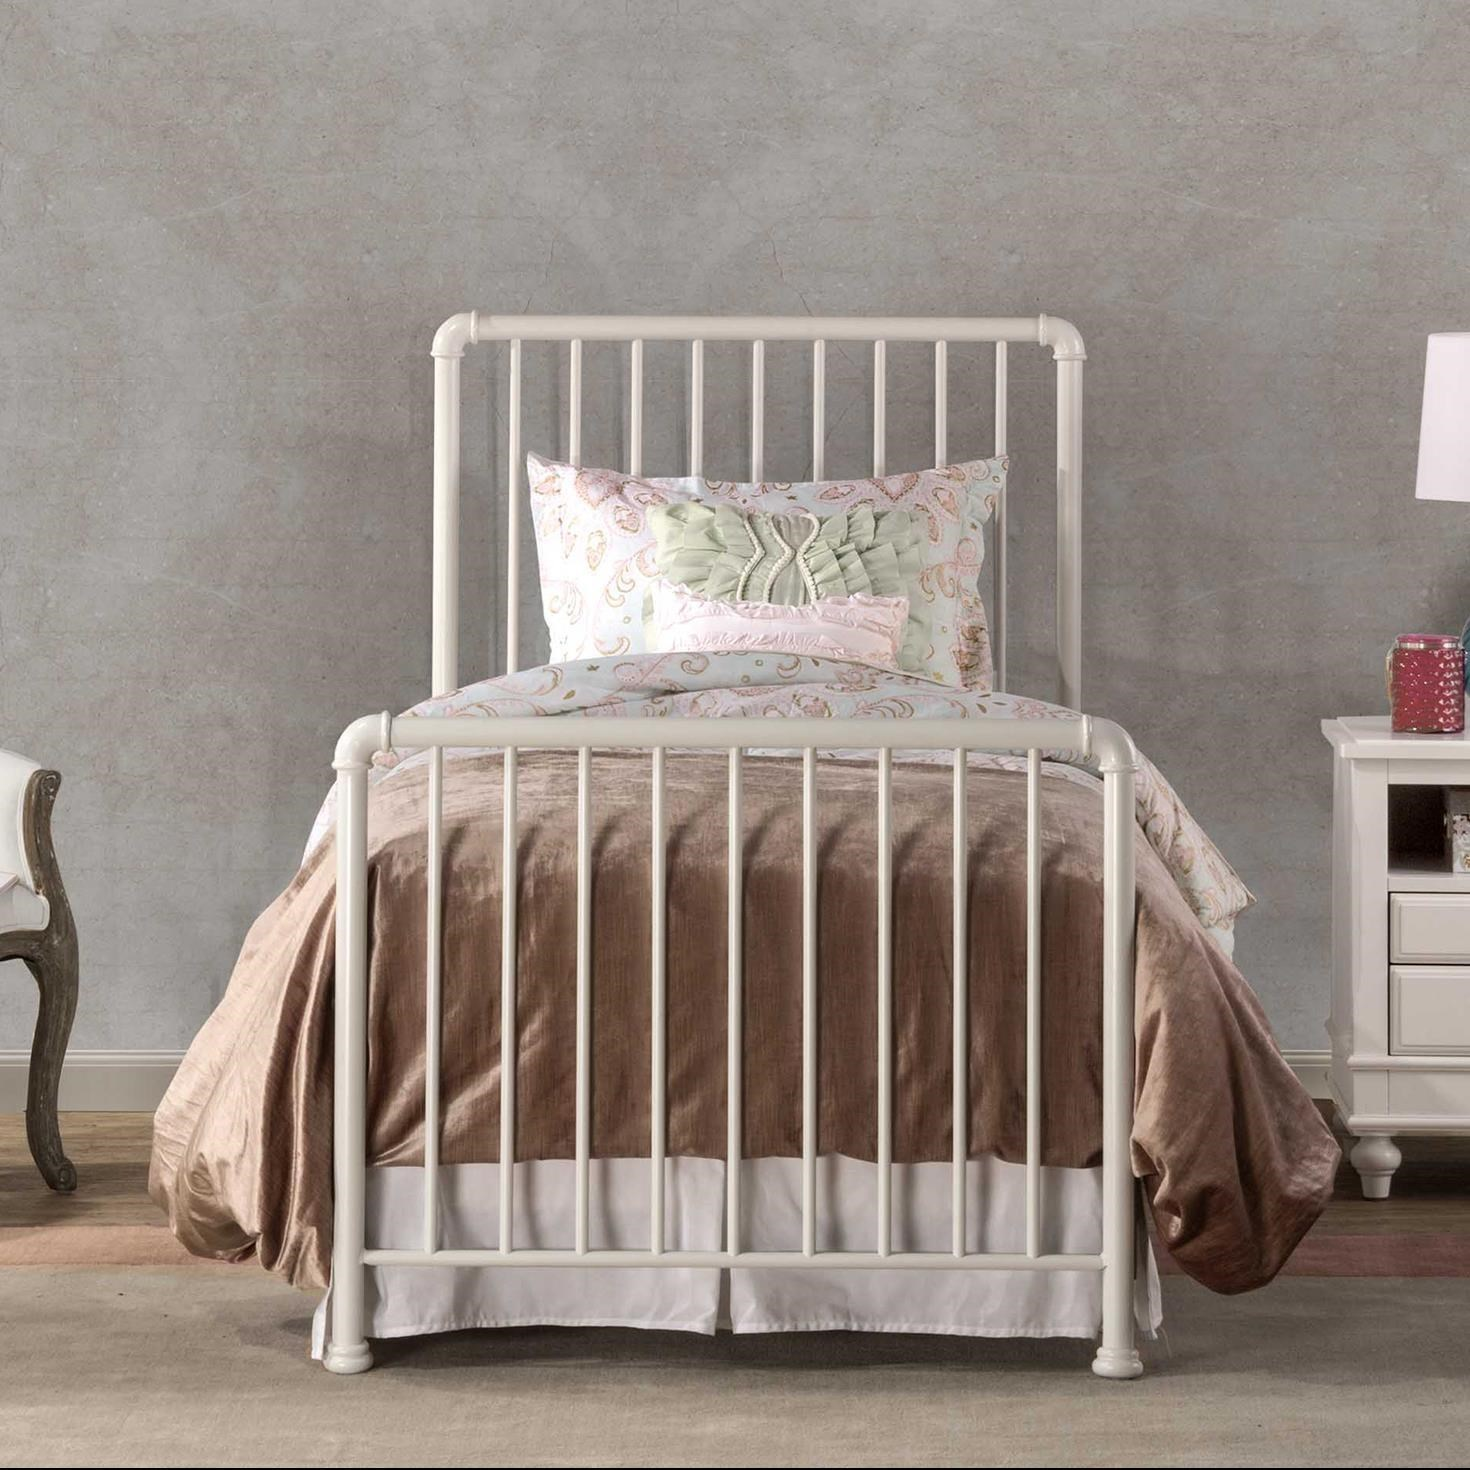 Hillsdale Brandi Twin Bed Set - Frame not Included - Item Number: 2001BTW